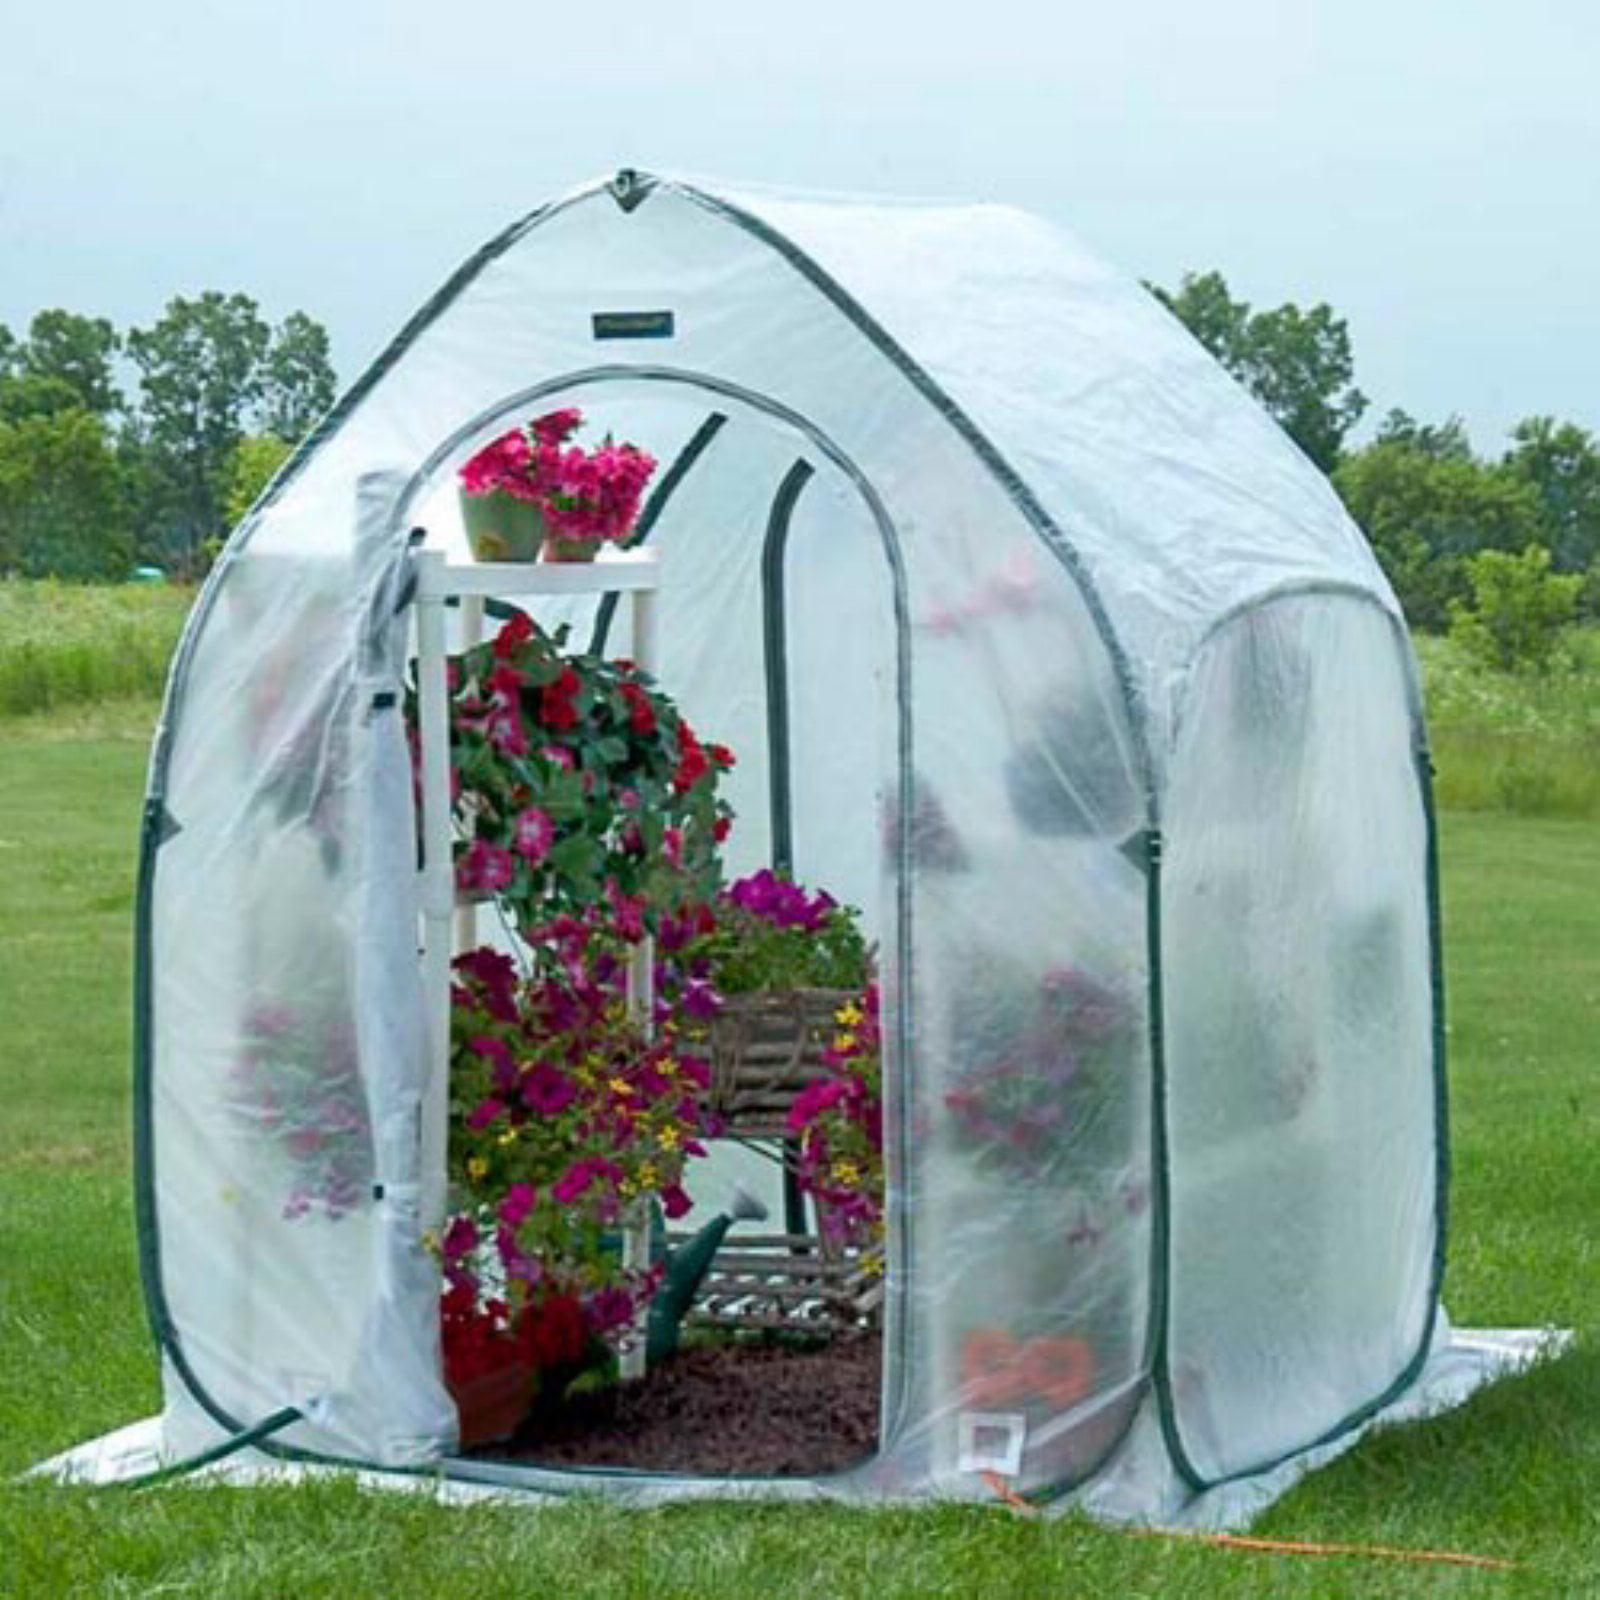 Flowerhouse 4' PlantHouse